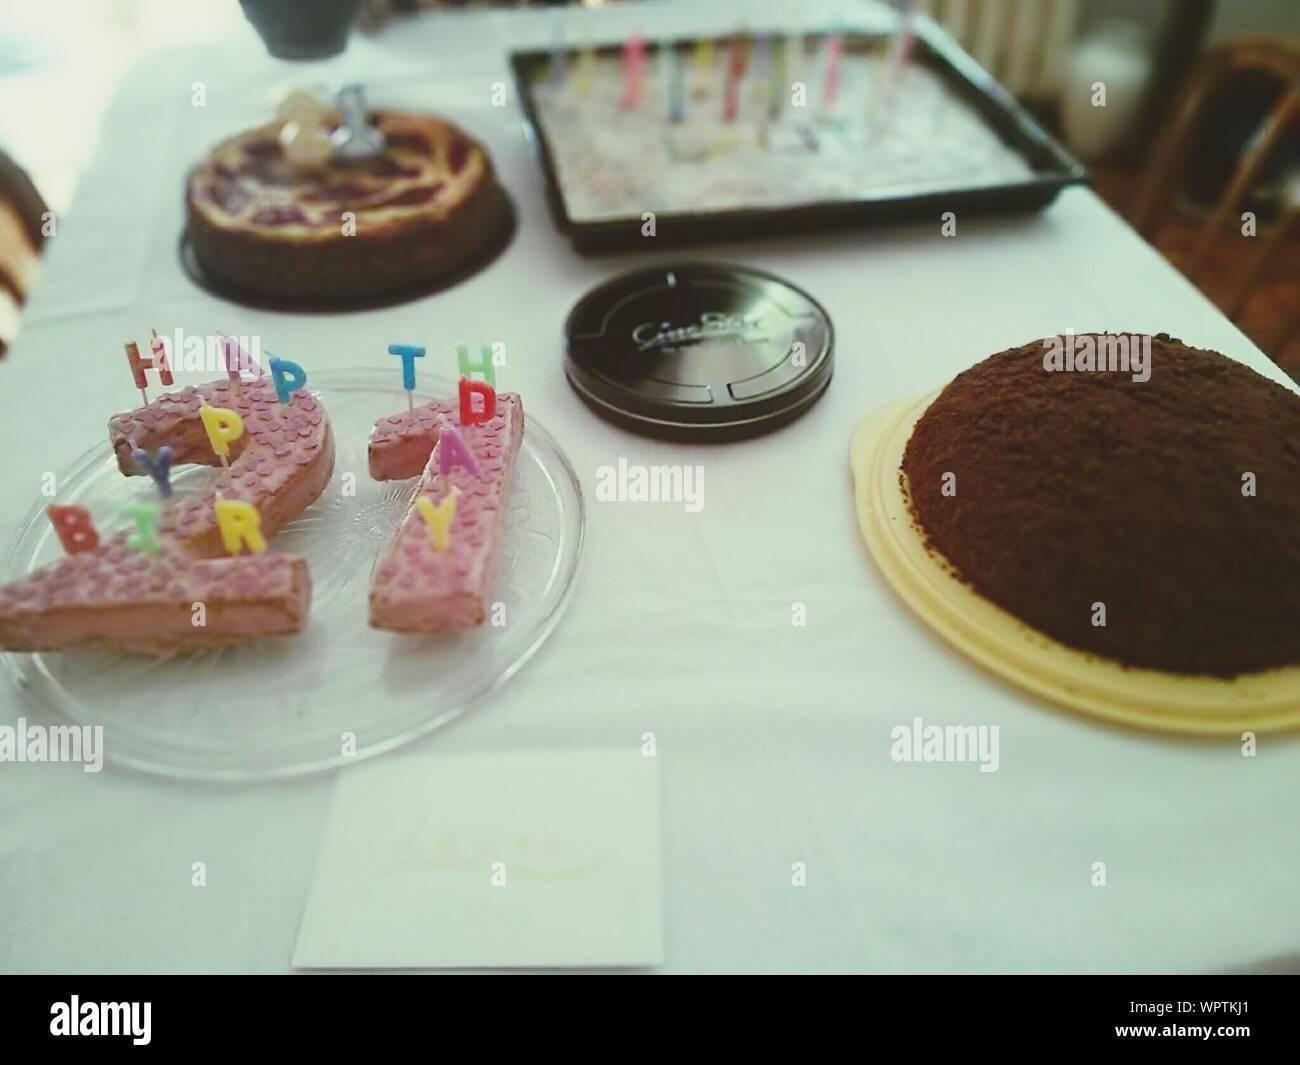 Groovy 21St Birthday Cake On Table Stock Photo 272220201 Alamy Personalised Birthday Cards Arneslily Jamesorg